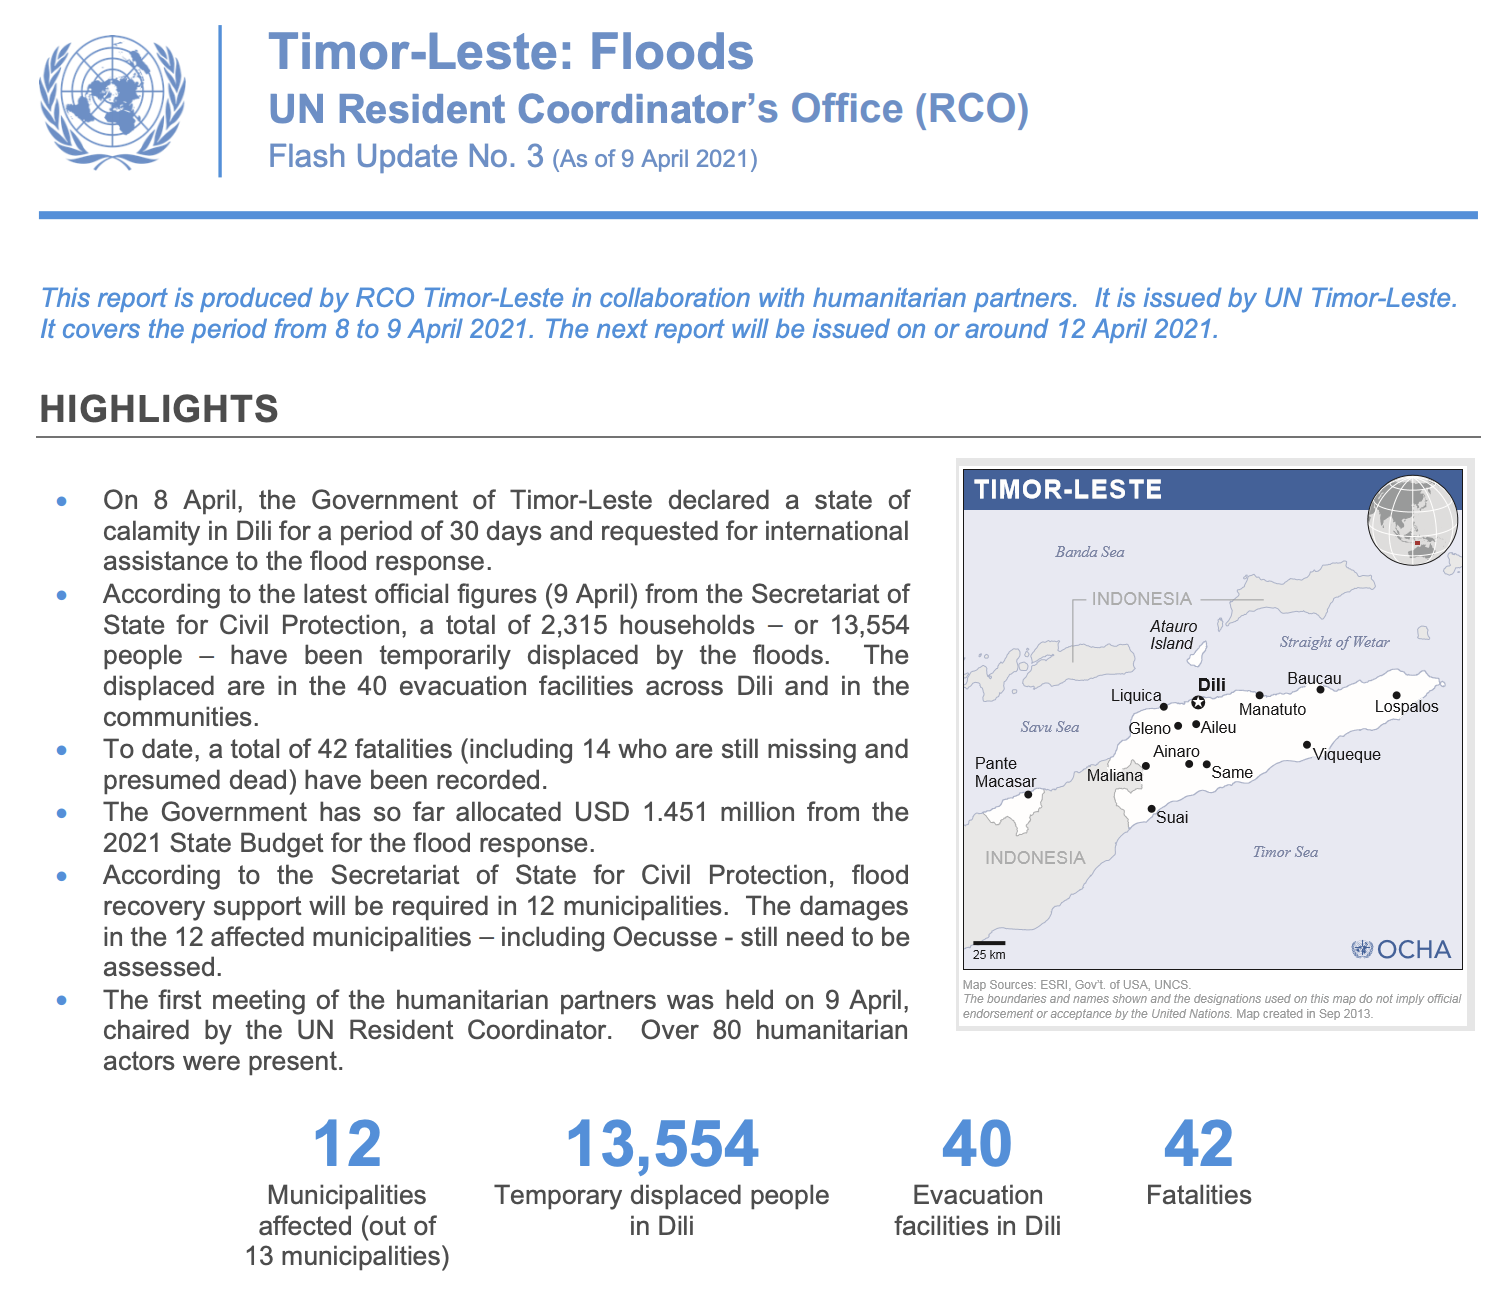 Timor-Leste Flood Response Flash Update No. 3 (9 April 2021)